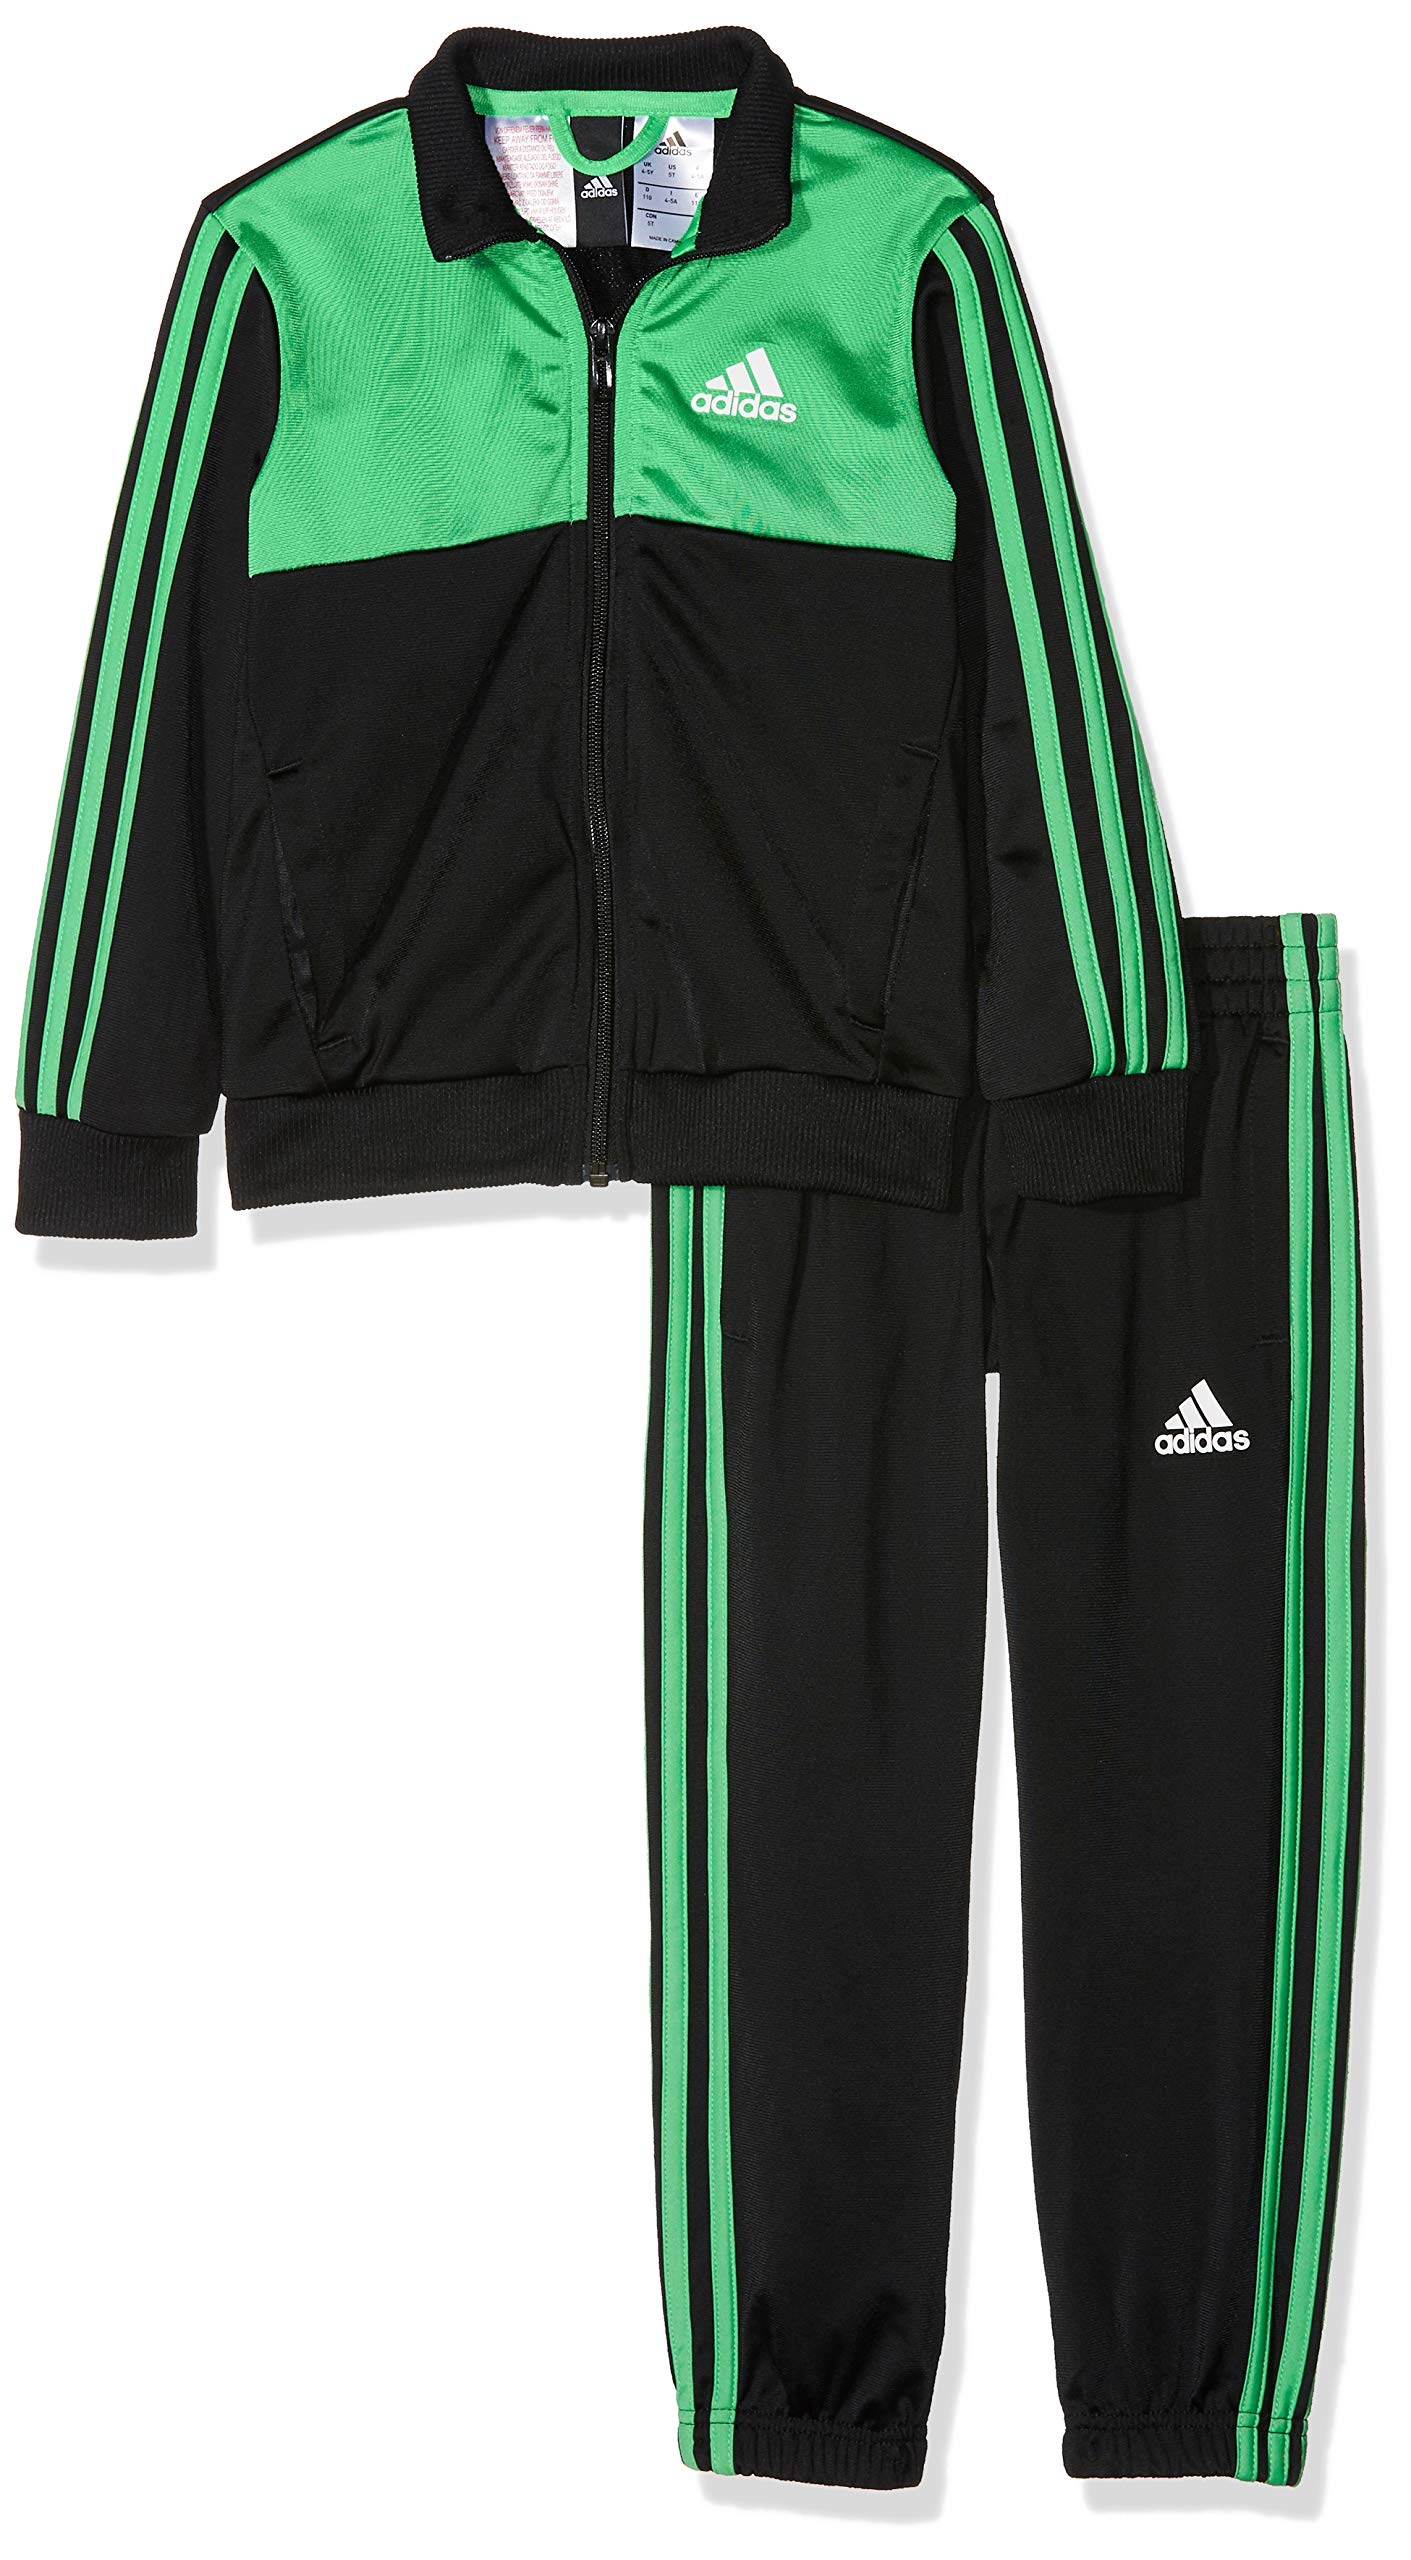 adidas Tibero Tracksuit - Boys - Black/Green - Age 11-12